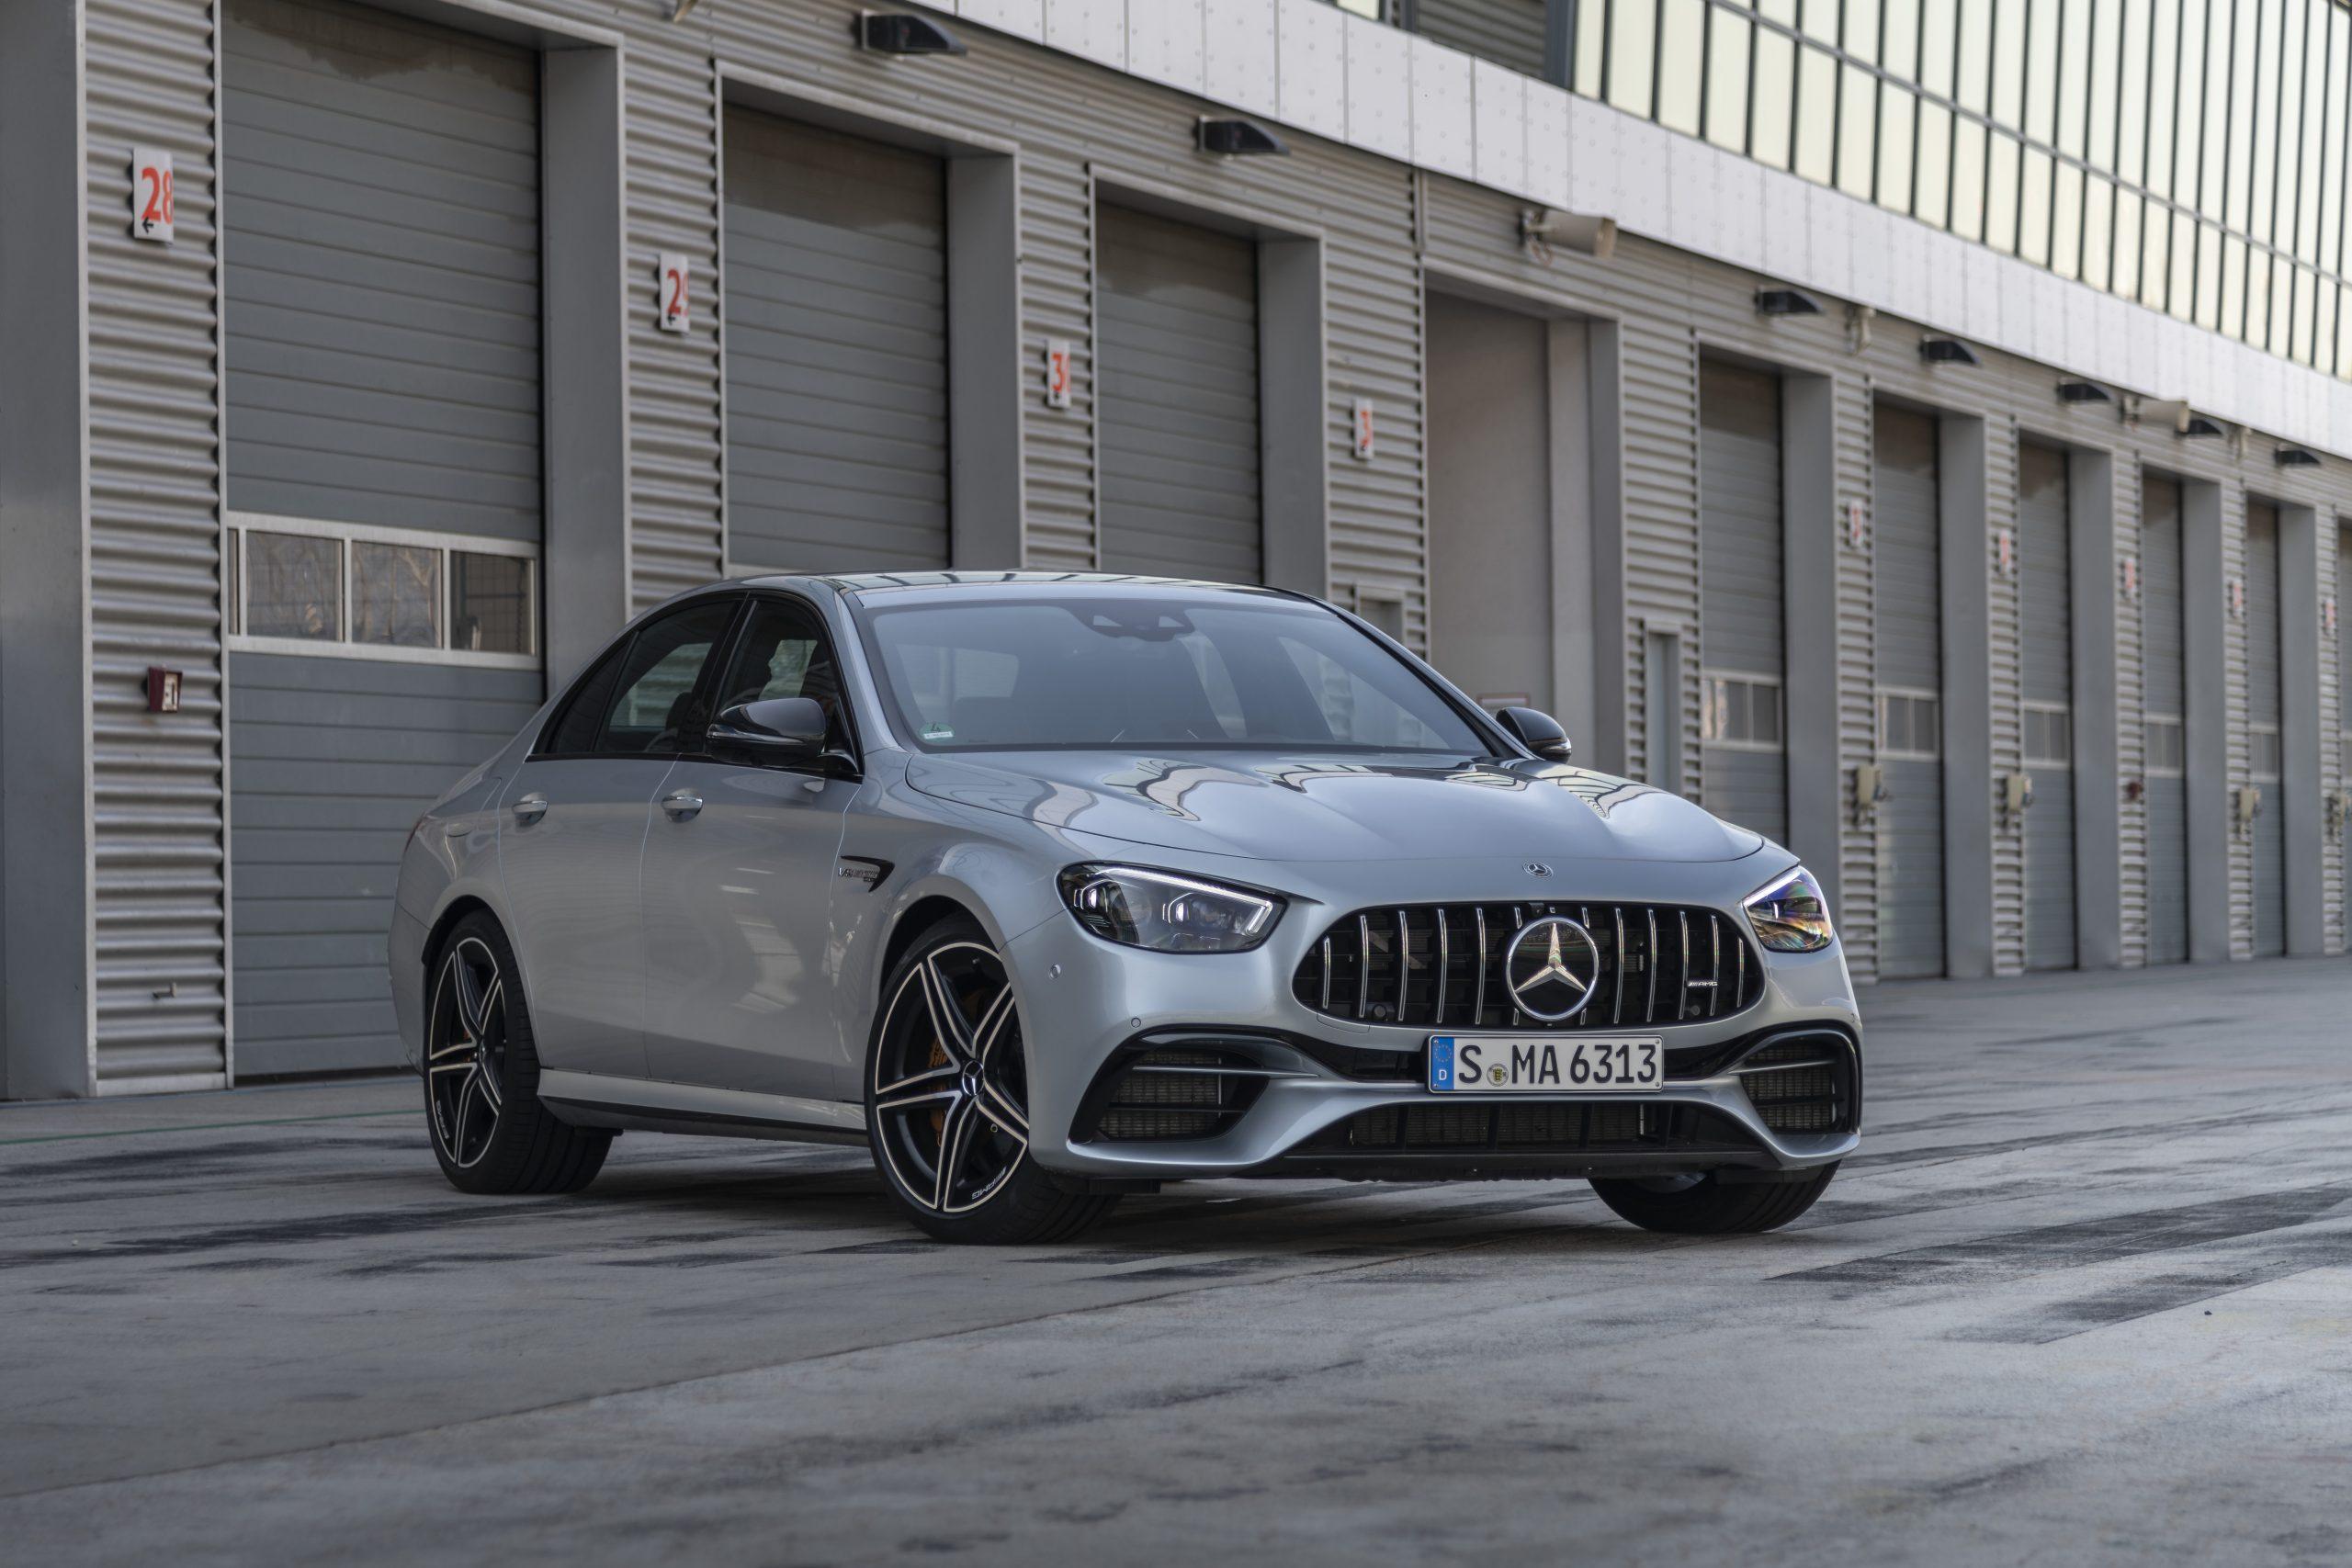 Fastest Four-Door Cars - 2021 Mercedes-AMG E 63 S